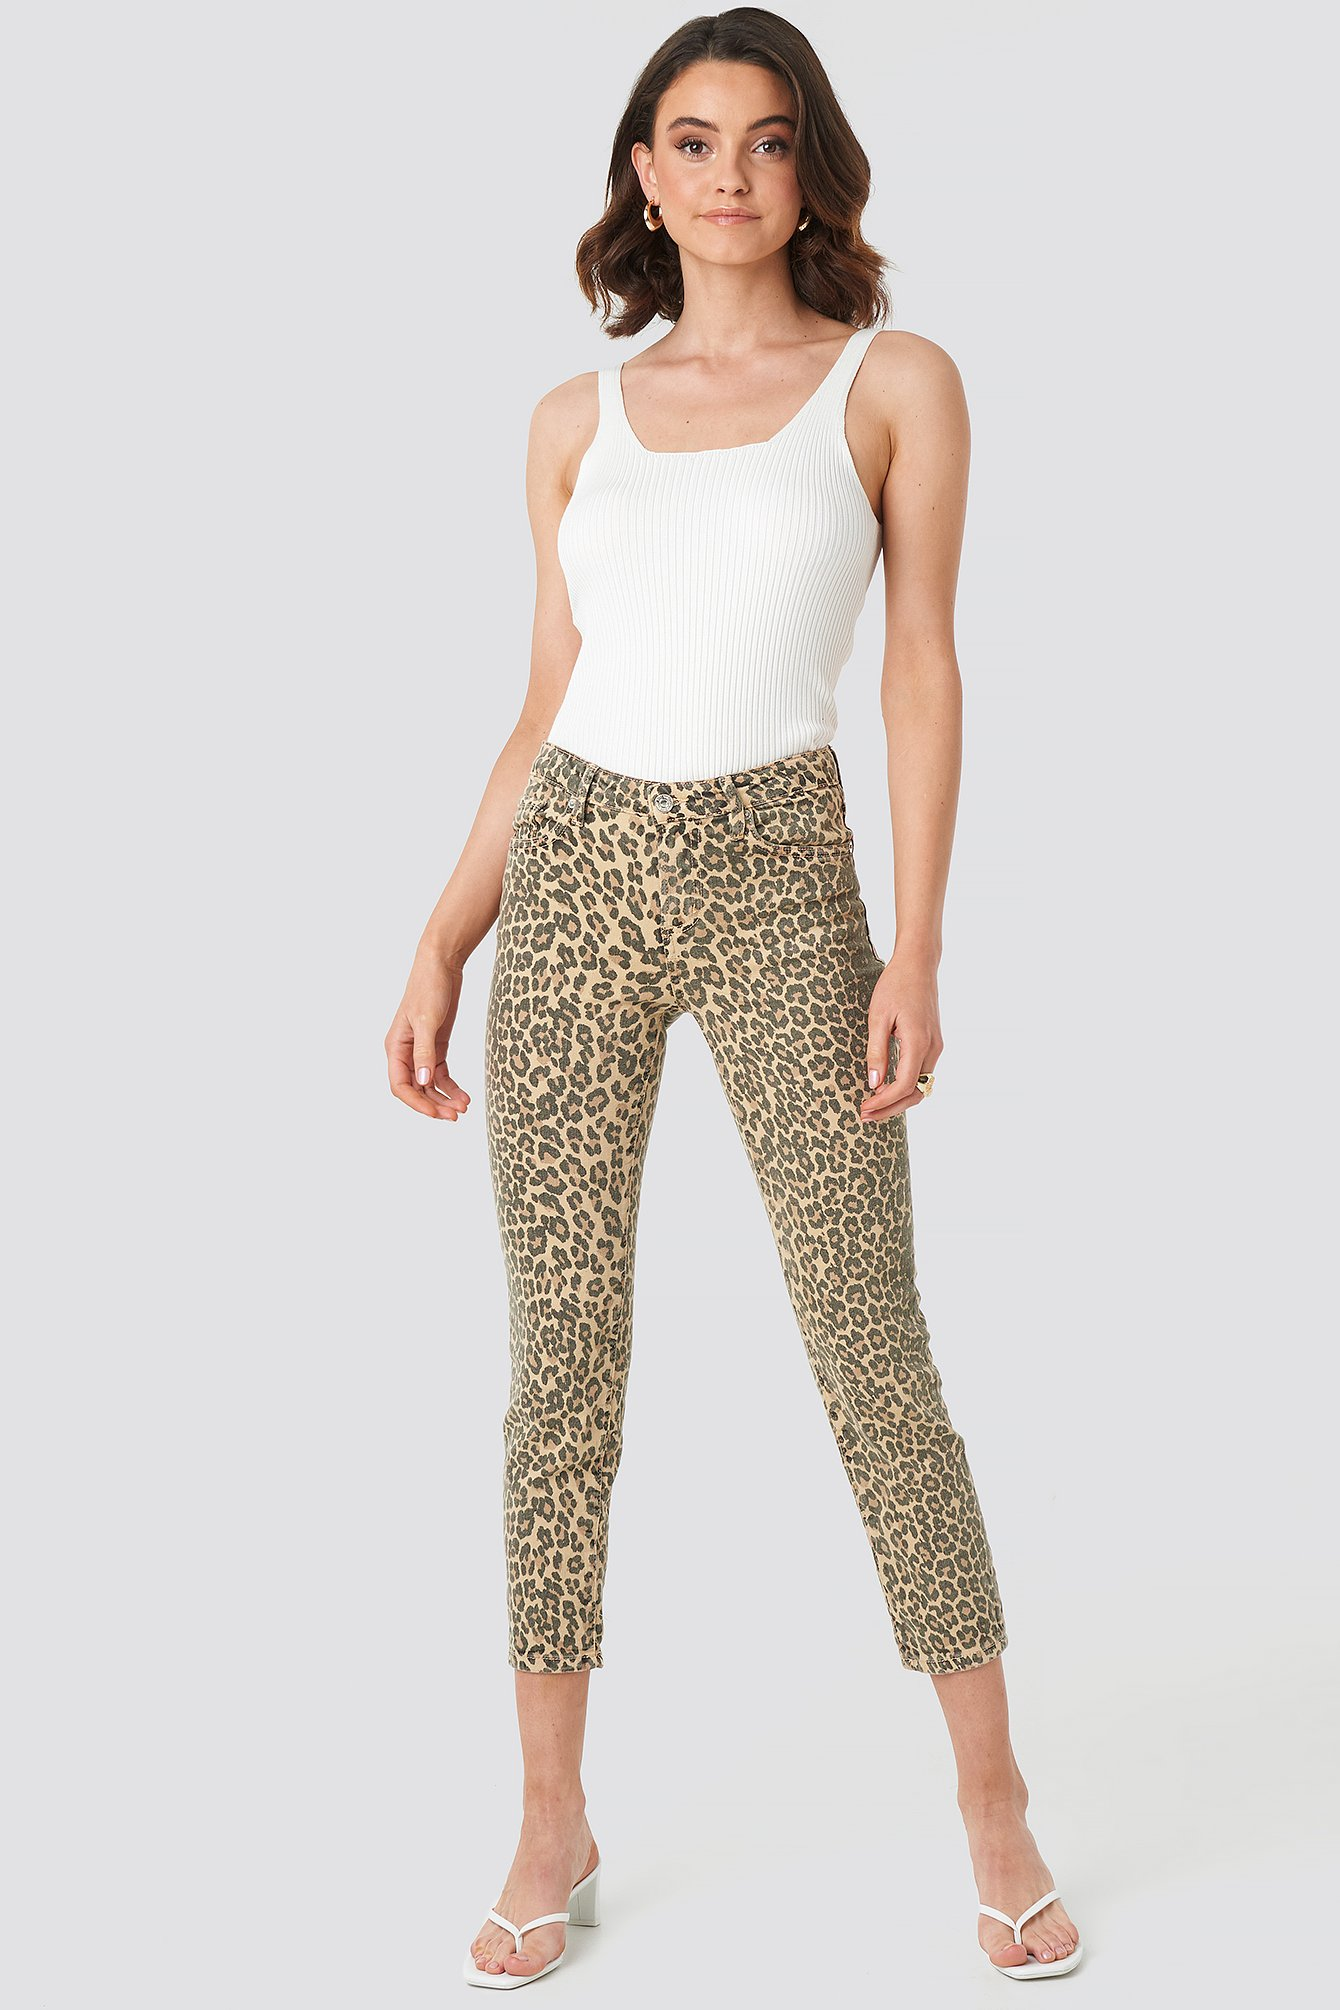 mango -  Animal Jeans - Beige